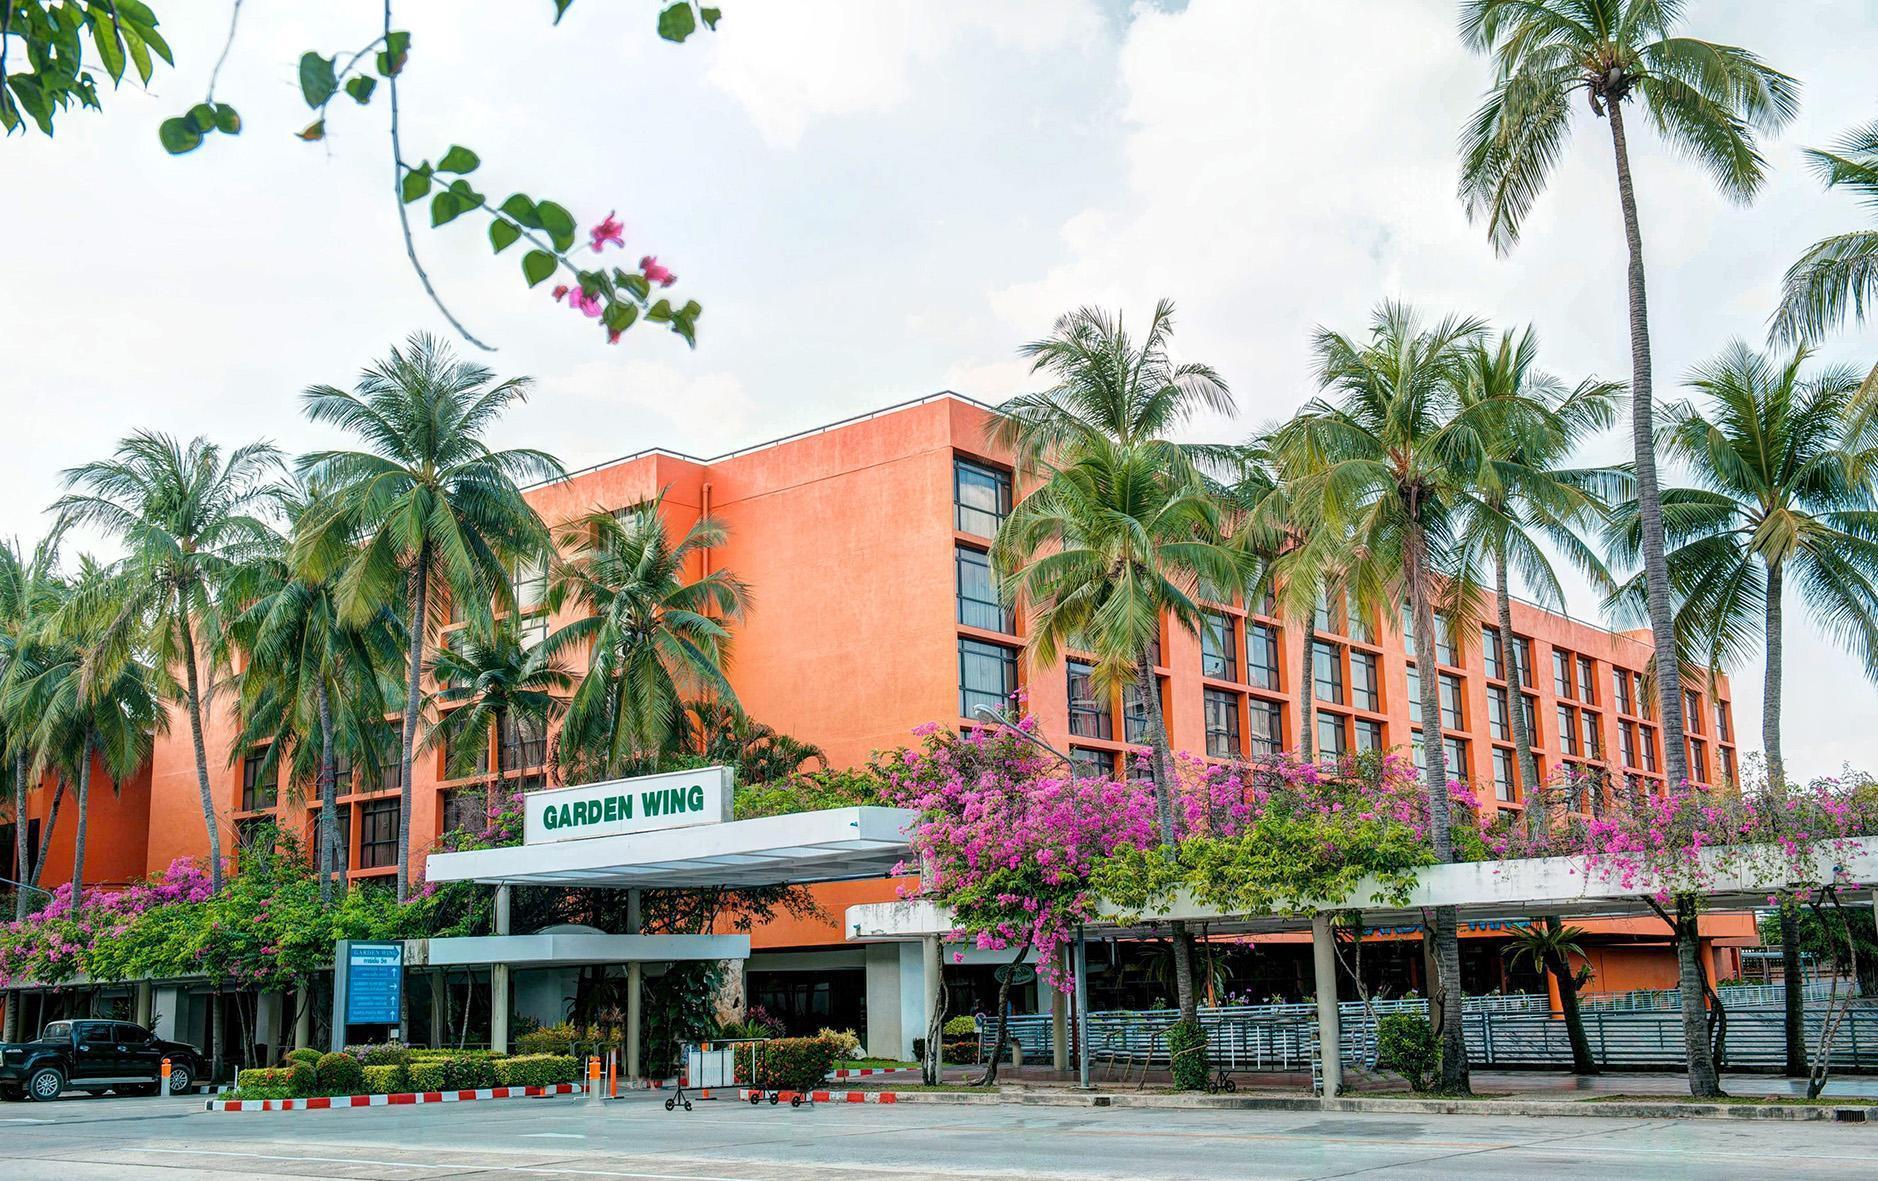 Ambassador City Jomtien Pattaya - Garden Wing แอมบาสซาเดอร์ ซิตี้ จอมเทียน พัทยา - การ์เดน วิง